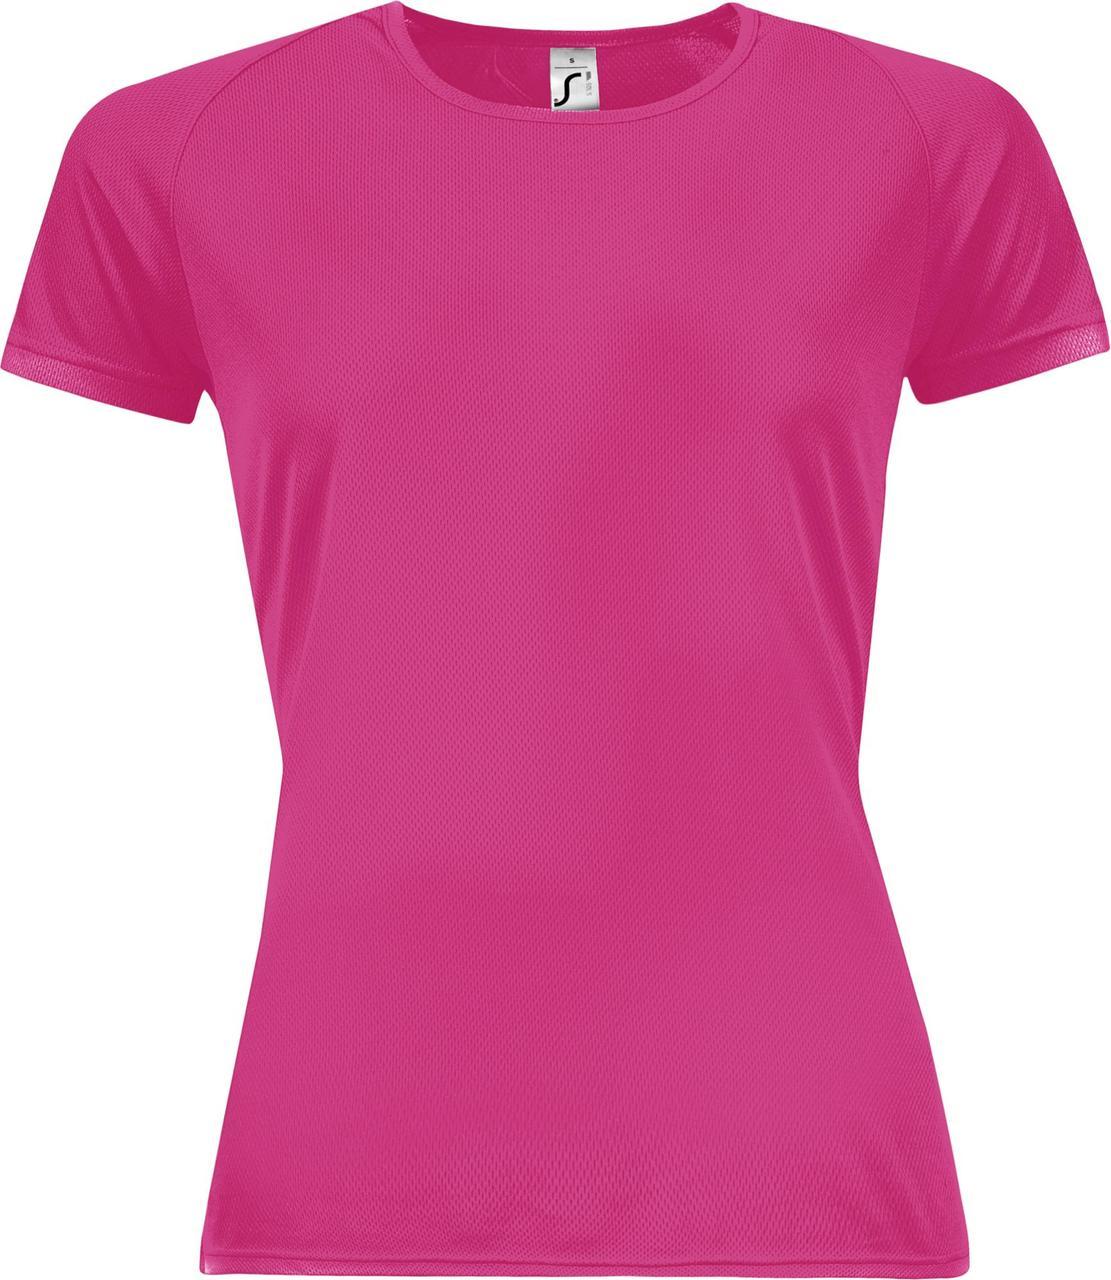 Футболка женская Sporty Women 140, розовый неон (артикул 01159129)